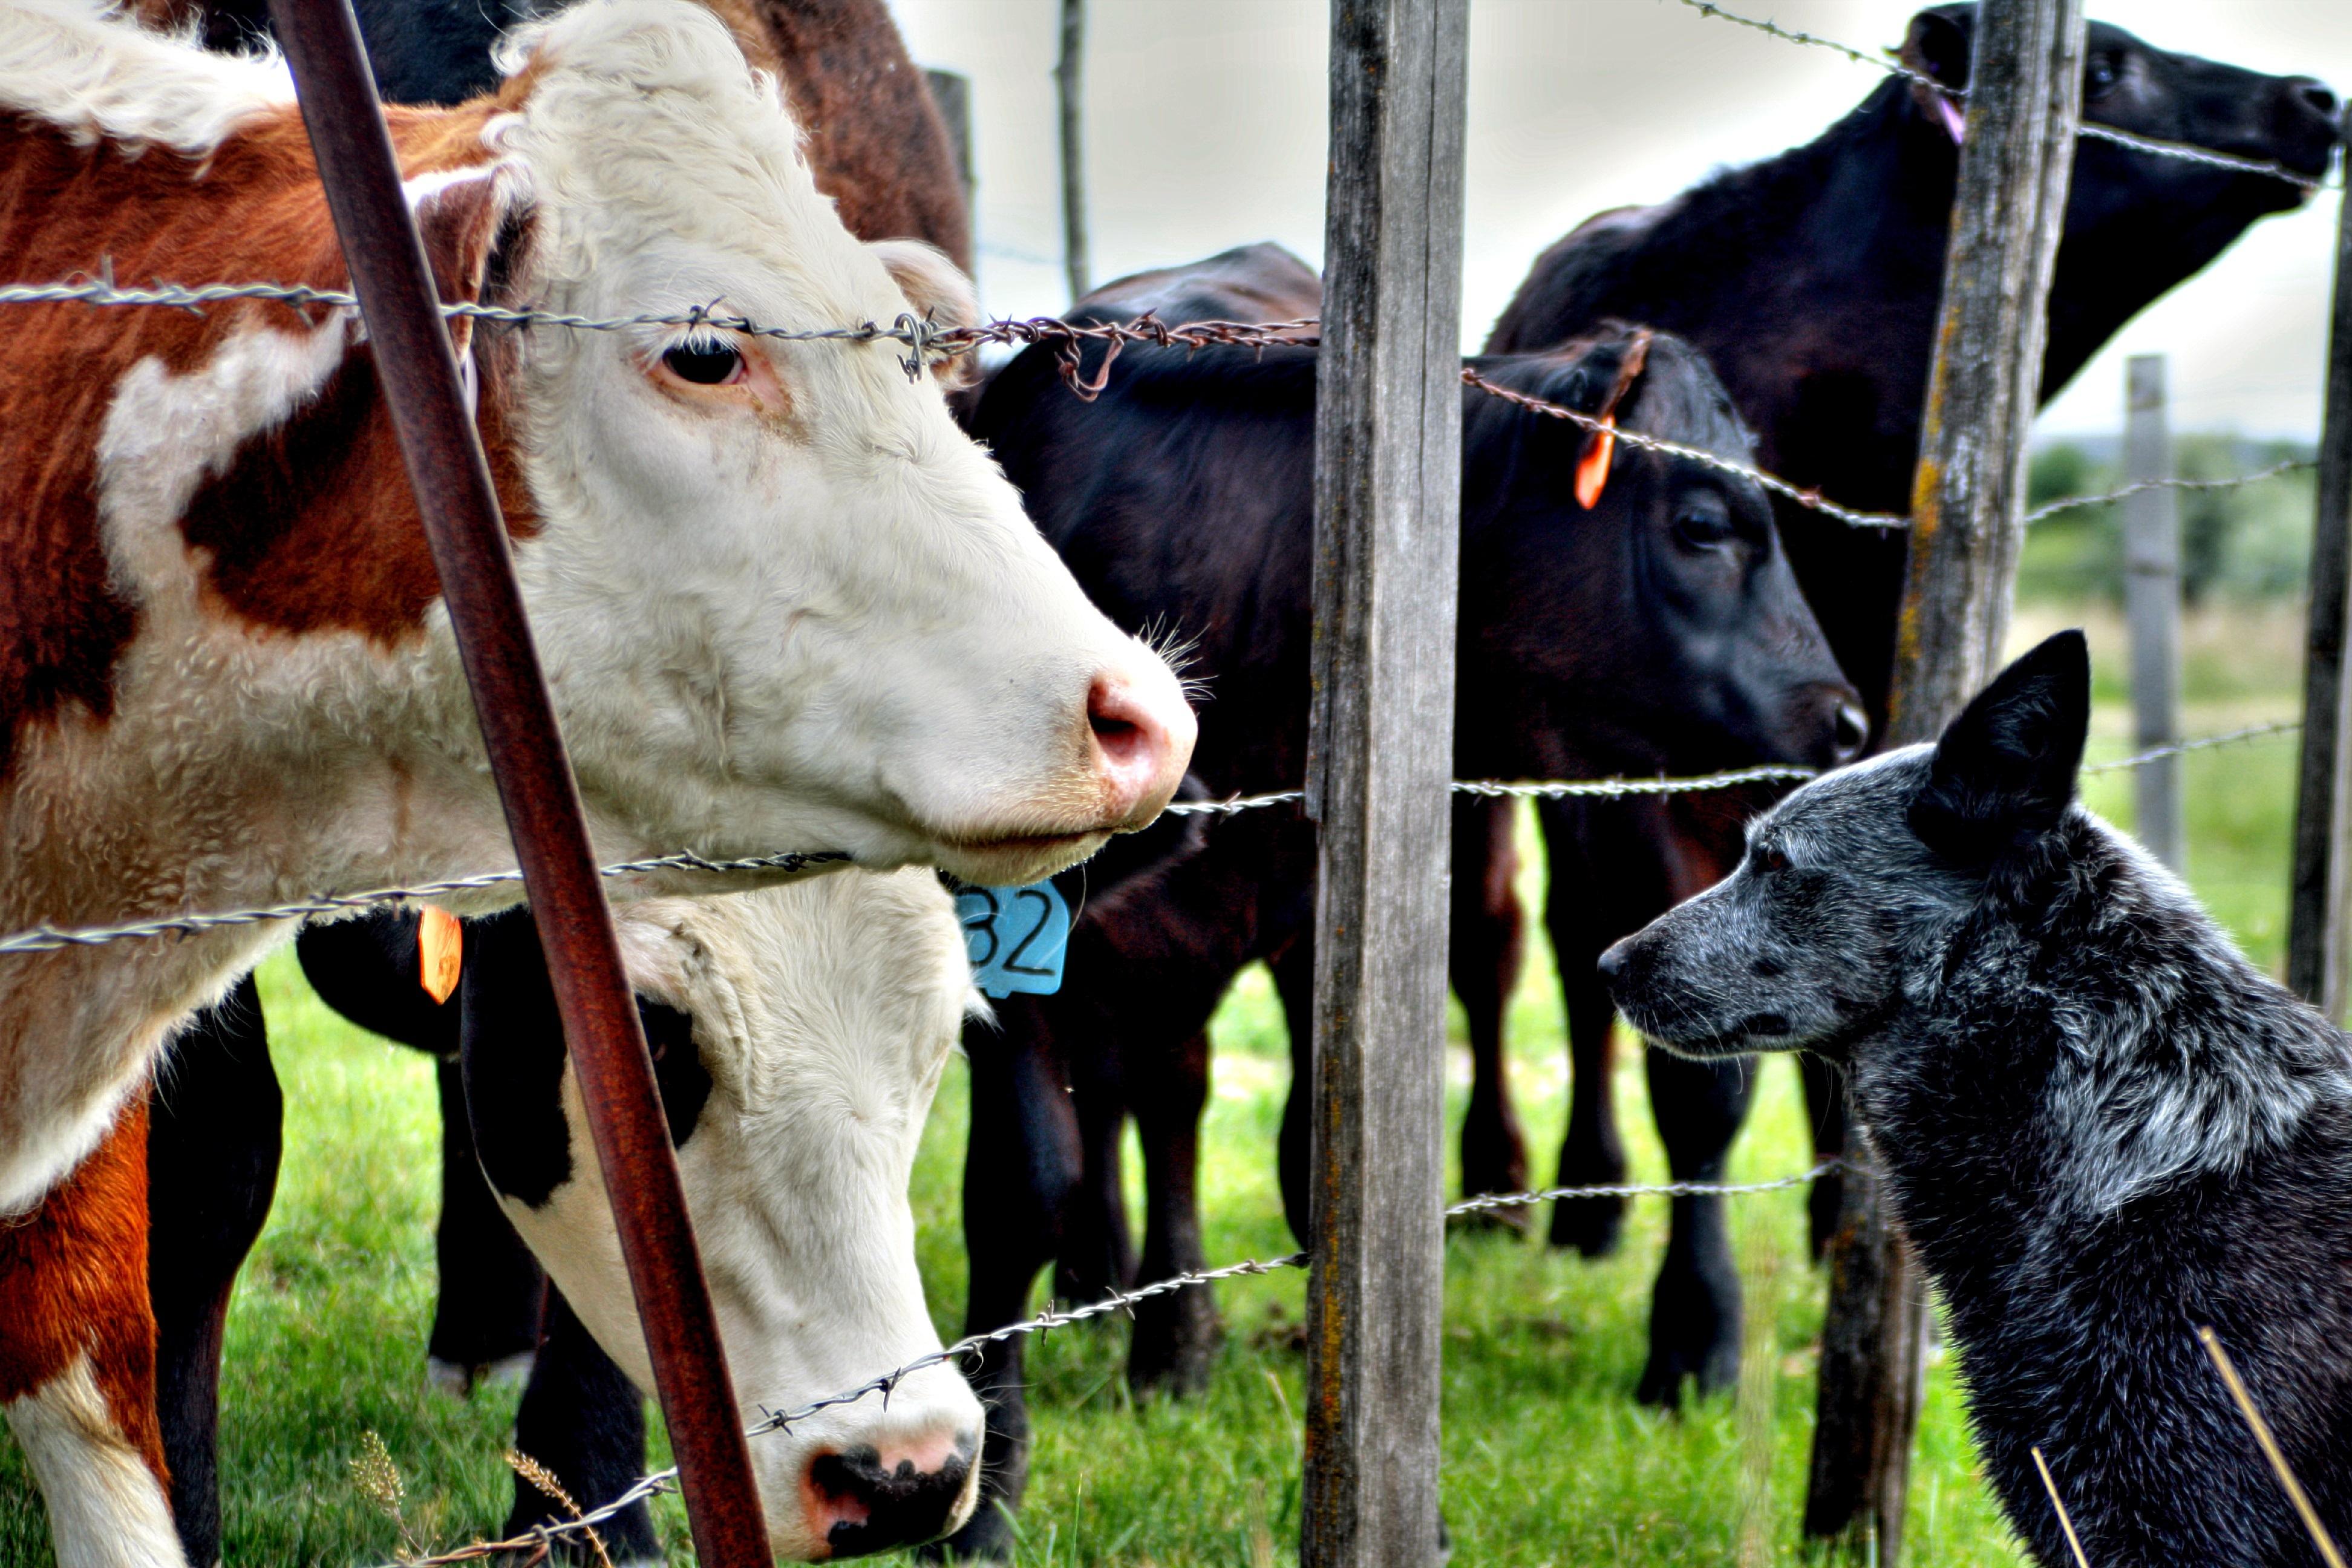 Calf, Animal, Buffalo, Cow, Dog, HQ Photo